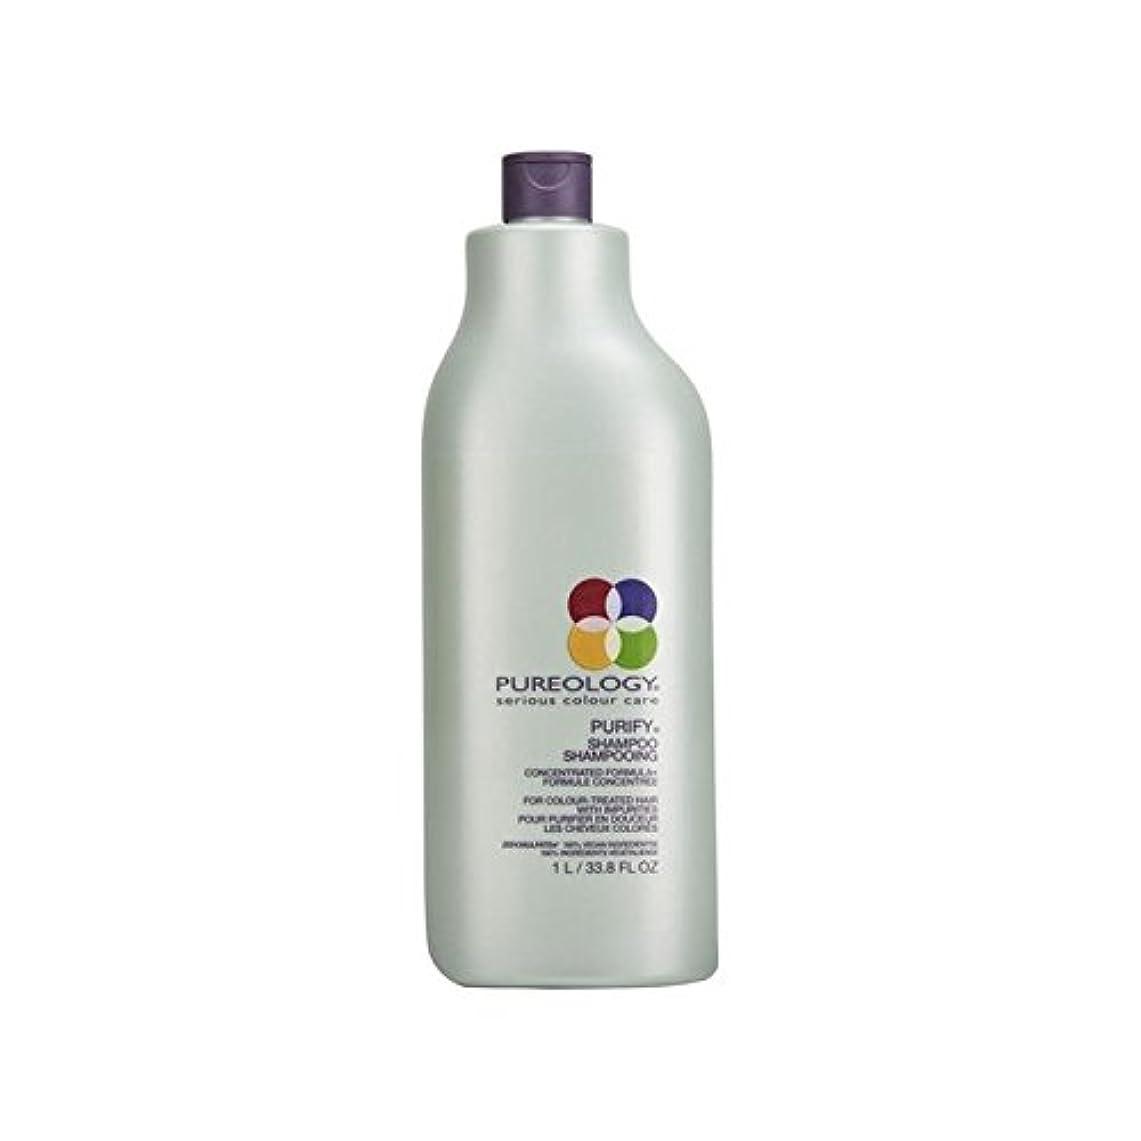 Pureology Purify Shampoo (1000ml) - ののシャンプー(千ミリリットル) [並行輸入品]